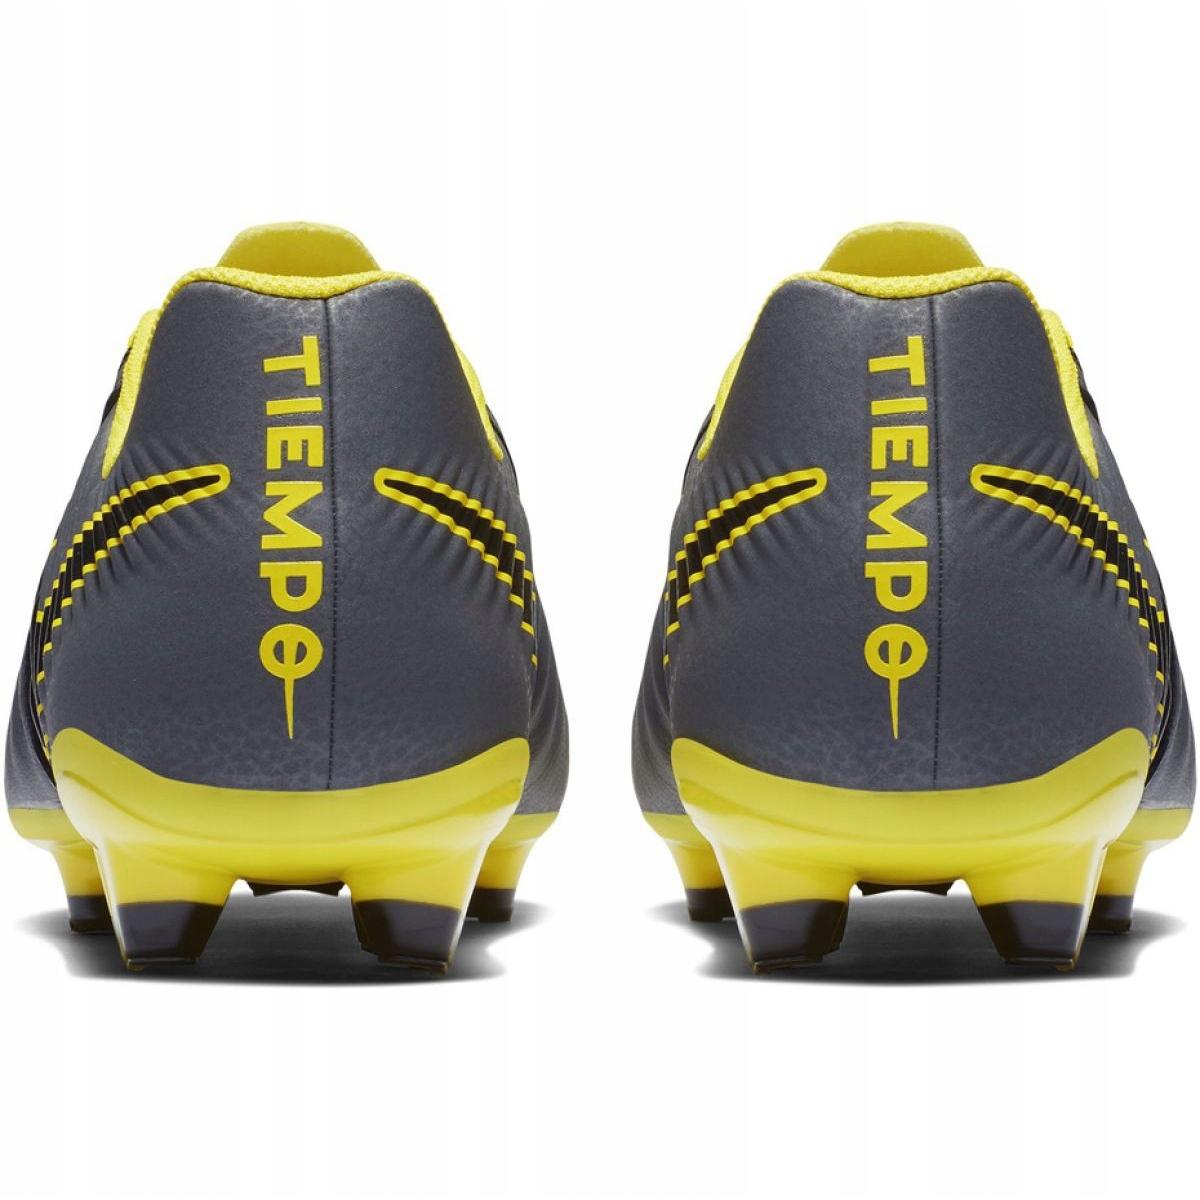 premium selection dd45a 87ce5 Football shoes Nike Tiempo Legend 7 Academy Fg M AH7242-070